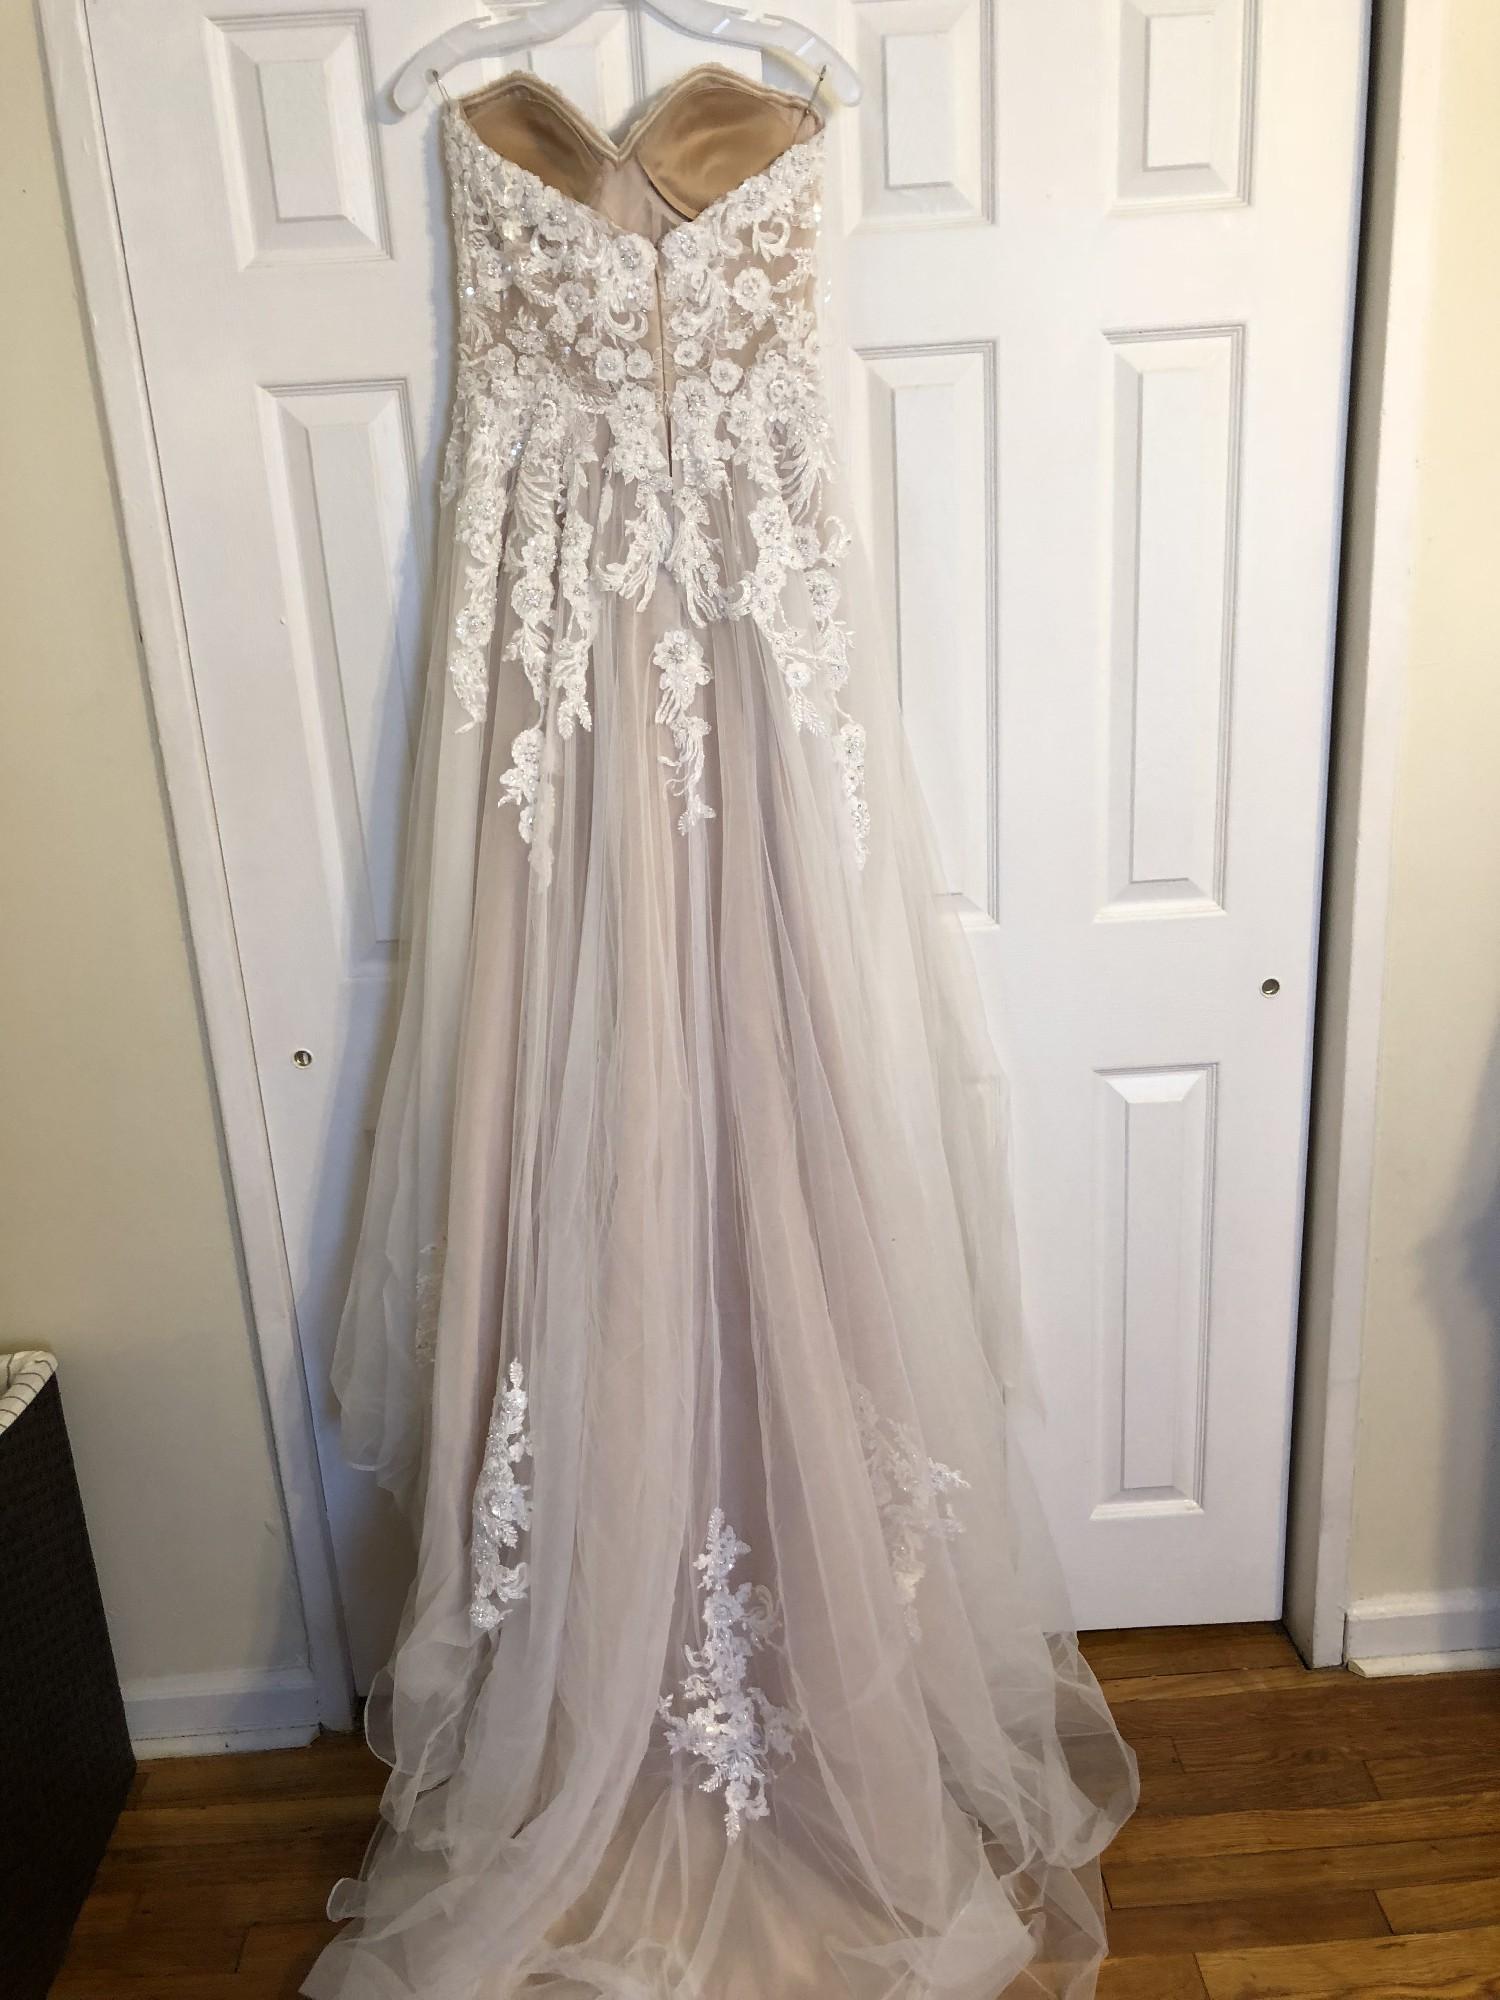 Rk Bridal Rk101 Used Wedding Dress Save 33 Stillwhite